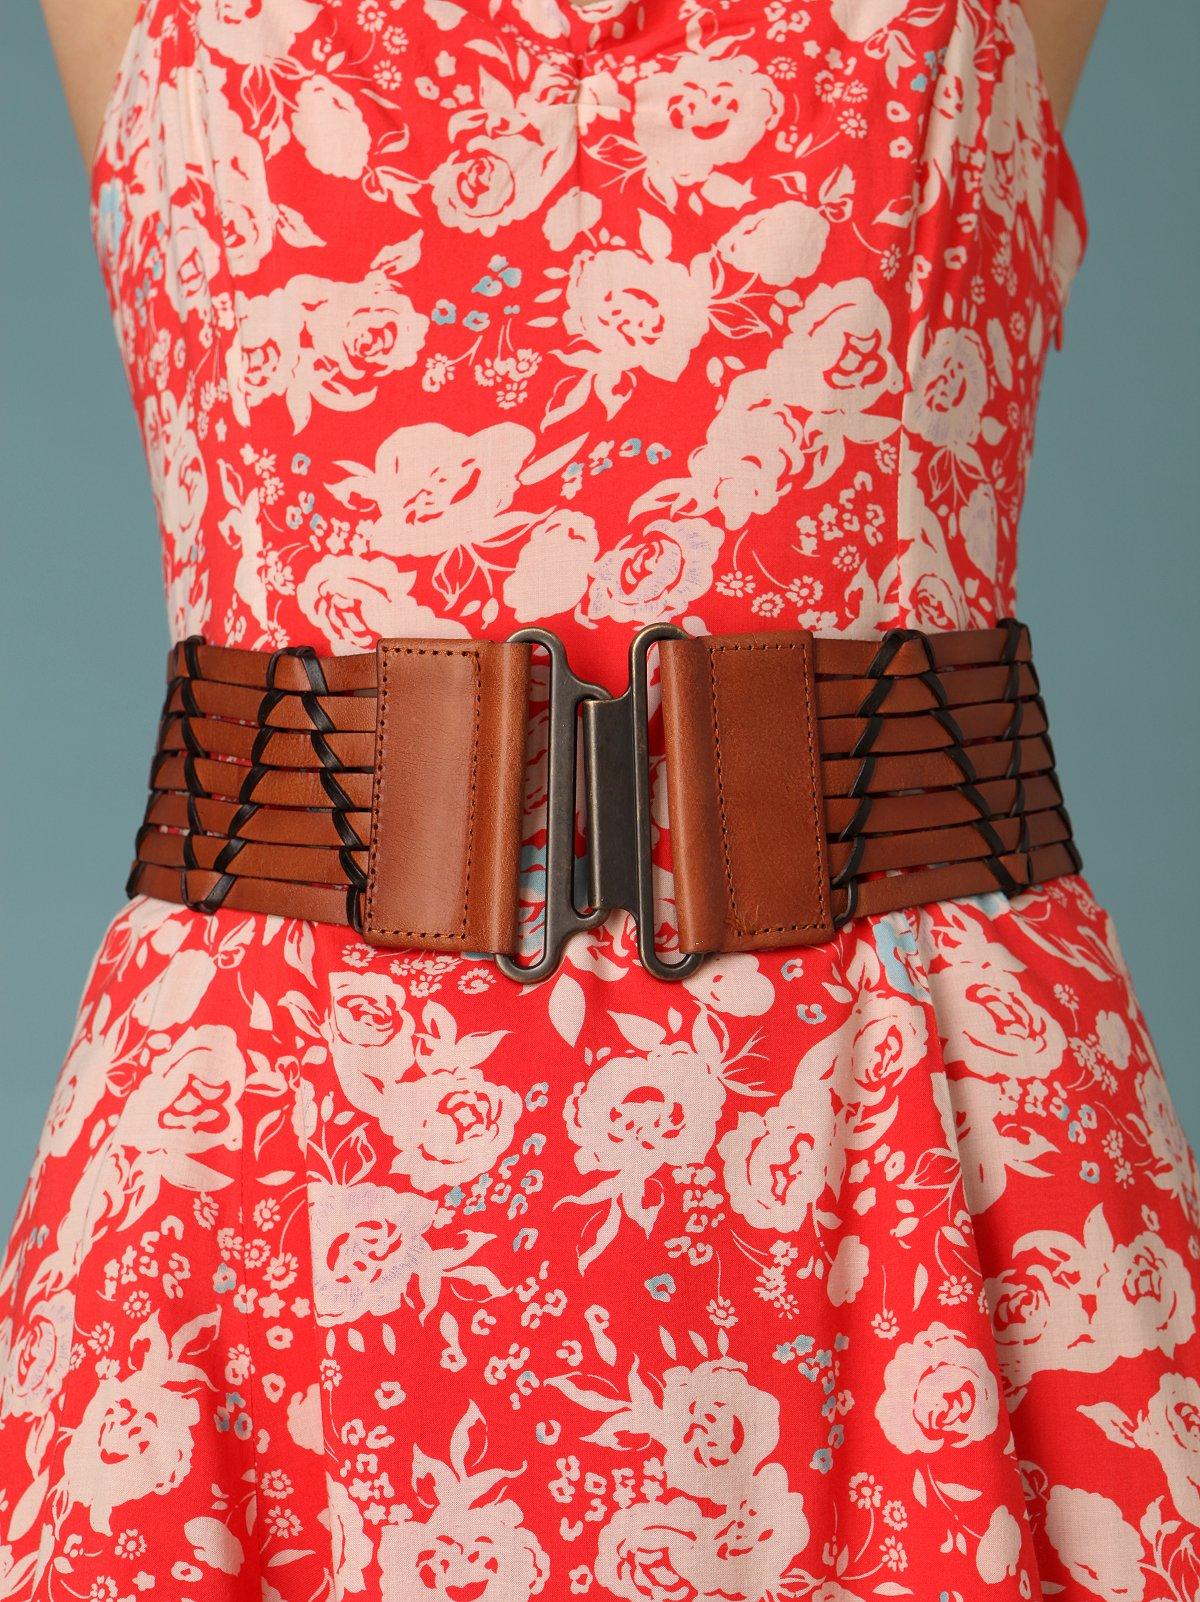 Woven Leather Stretch Waist Belt